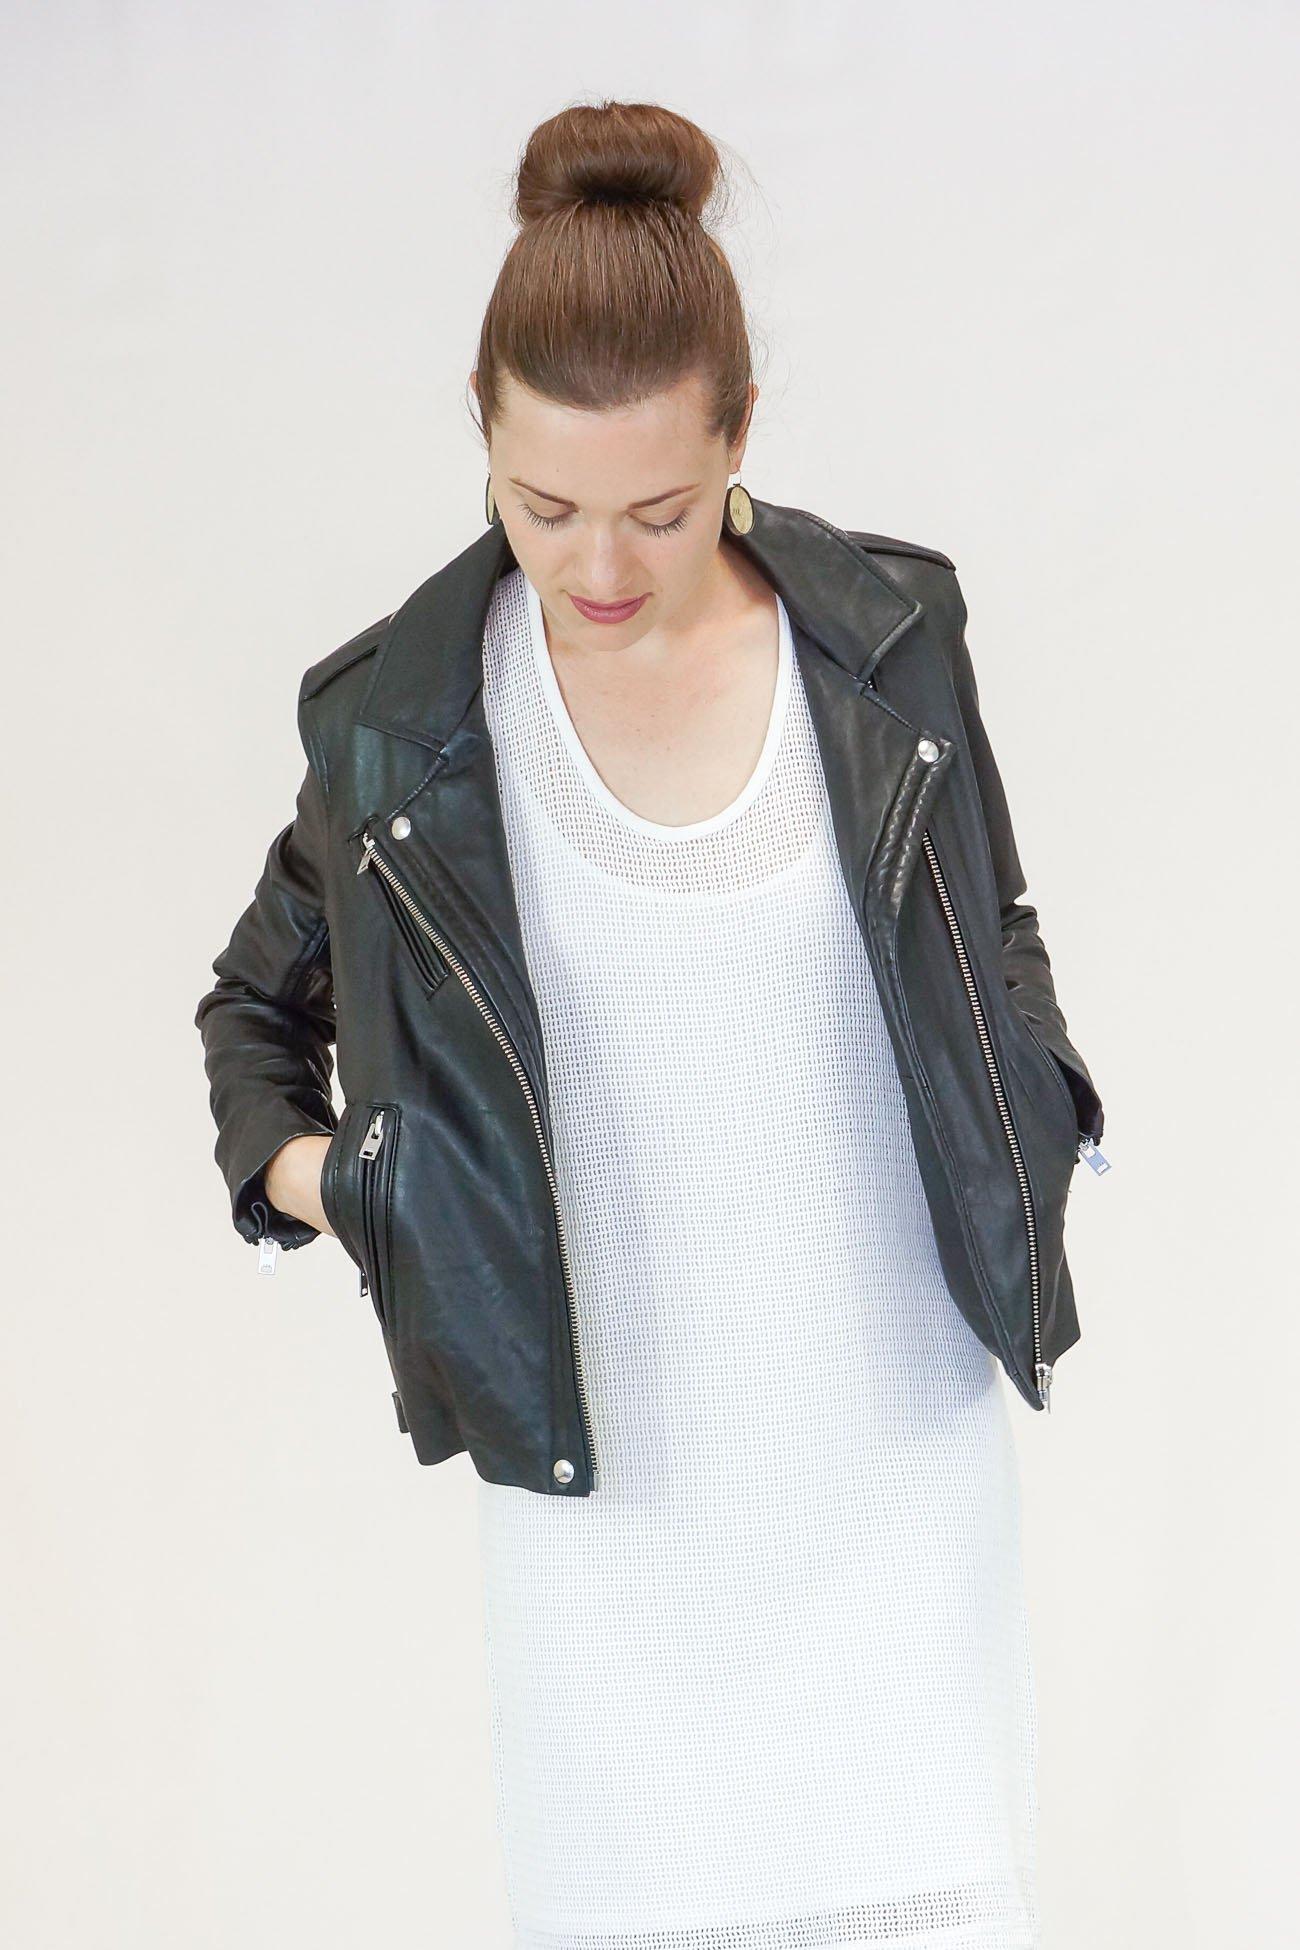 Iro Han Black Leather Moto Jacket Tamarind Black Leather Moto Jacket Leather Moto Jacket Moto Jacket [ 1950 x 1300 Pixel ]